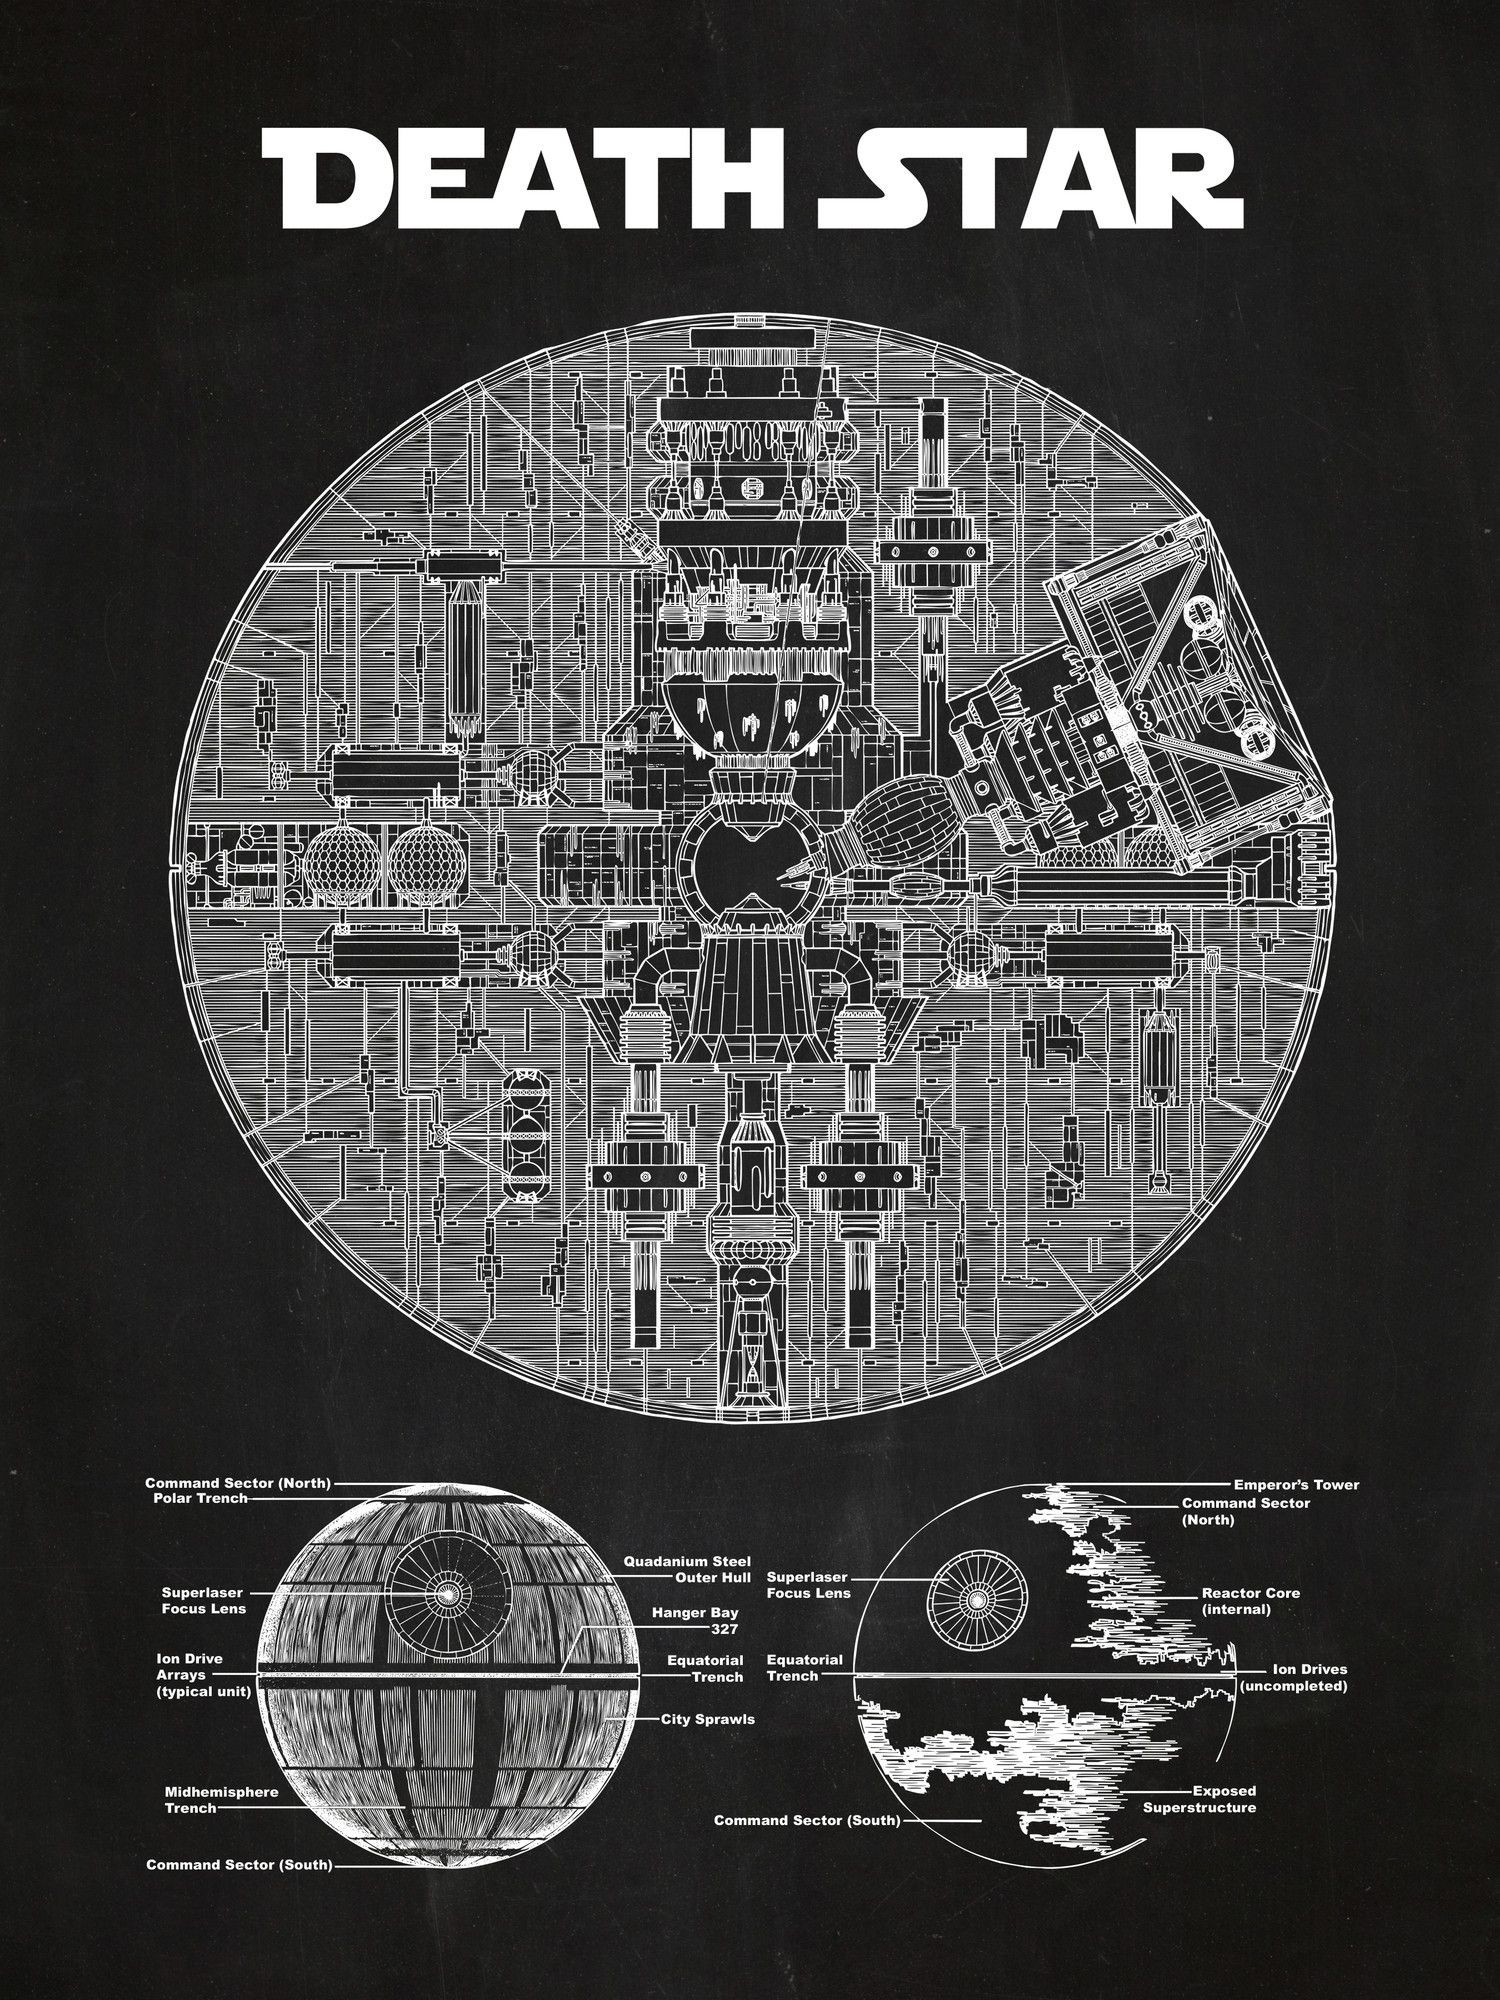 Star Wars Death Star Blueprint Graphic Art Poster in Chalkboard/White Ink …